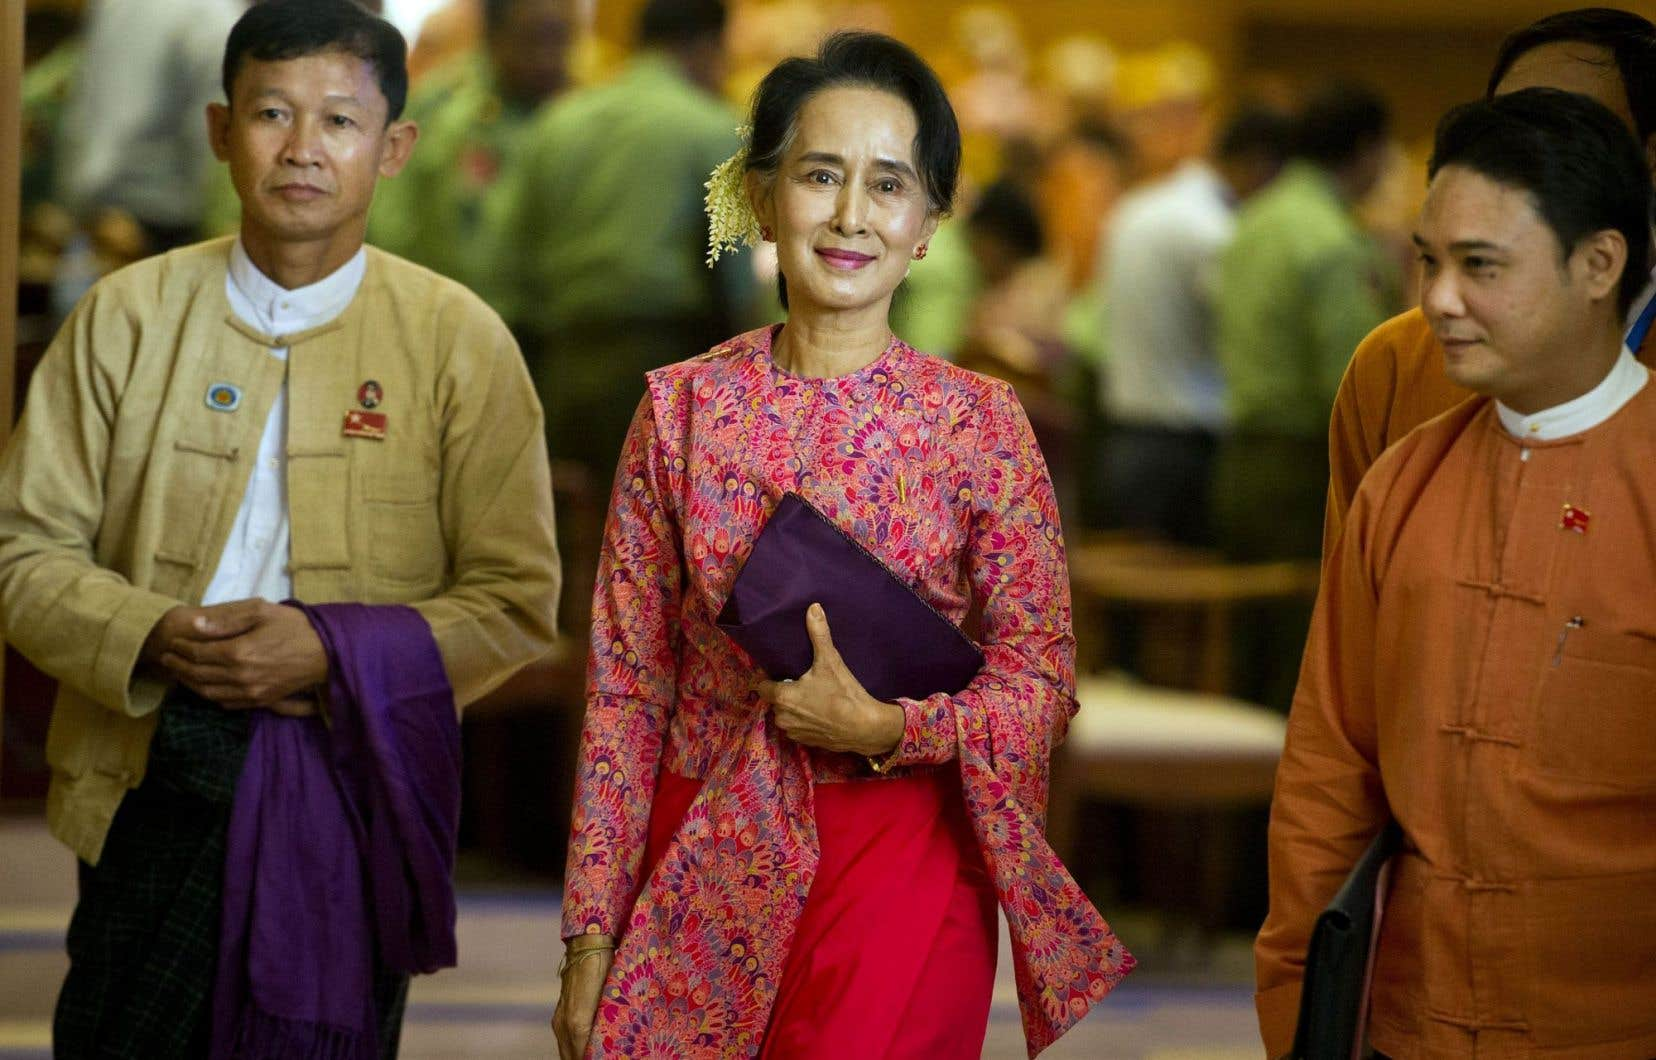 Aung San Suu Kyi lundi à sa sortie du Parlement